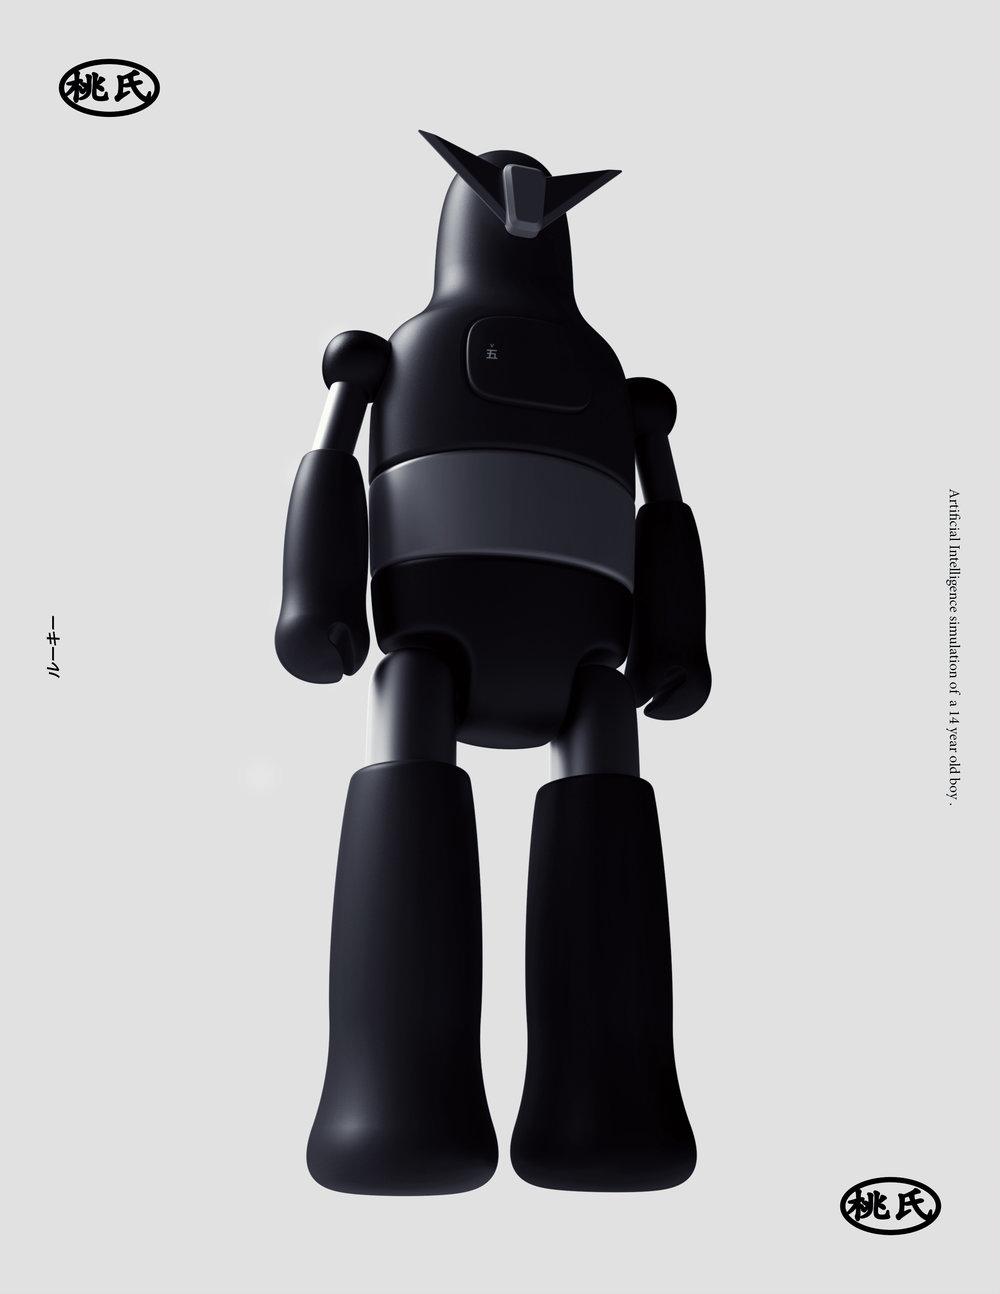 rooki poster 2.jpg